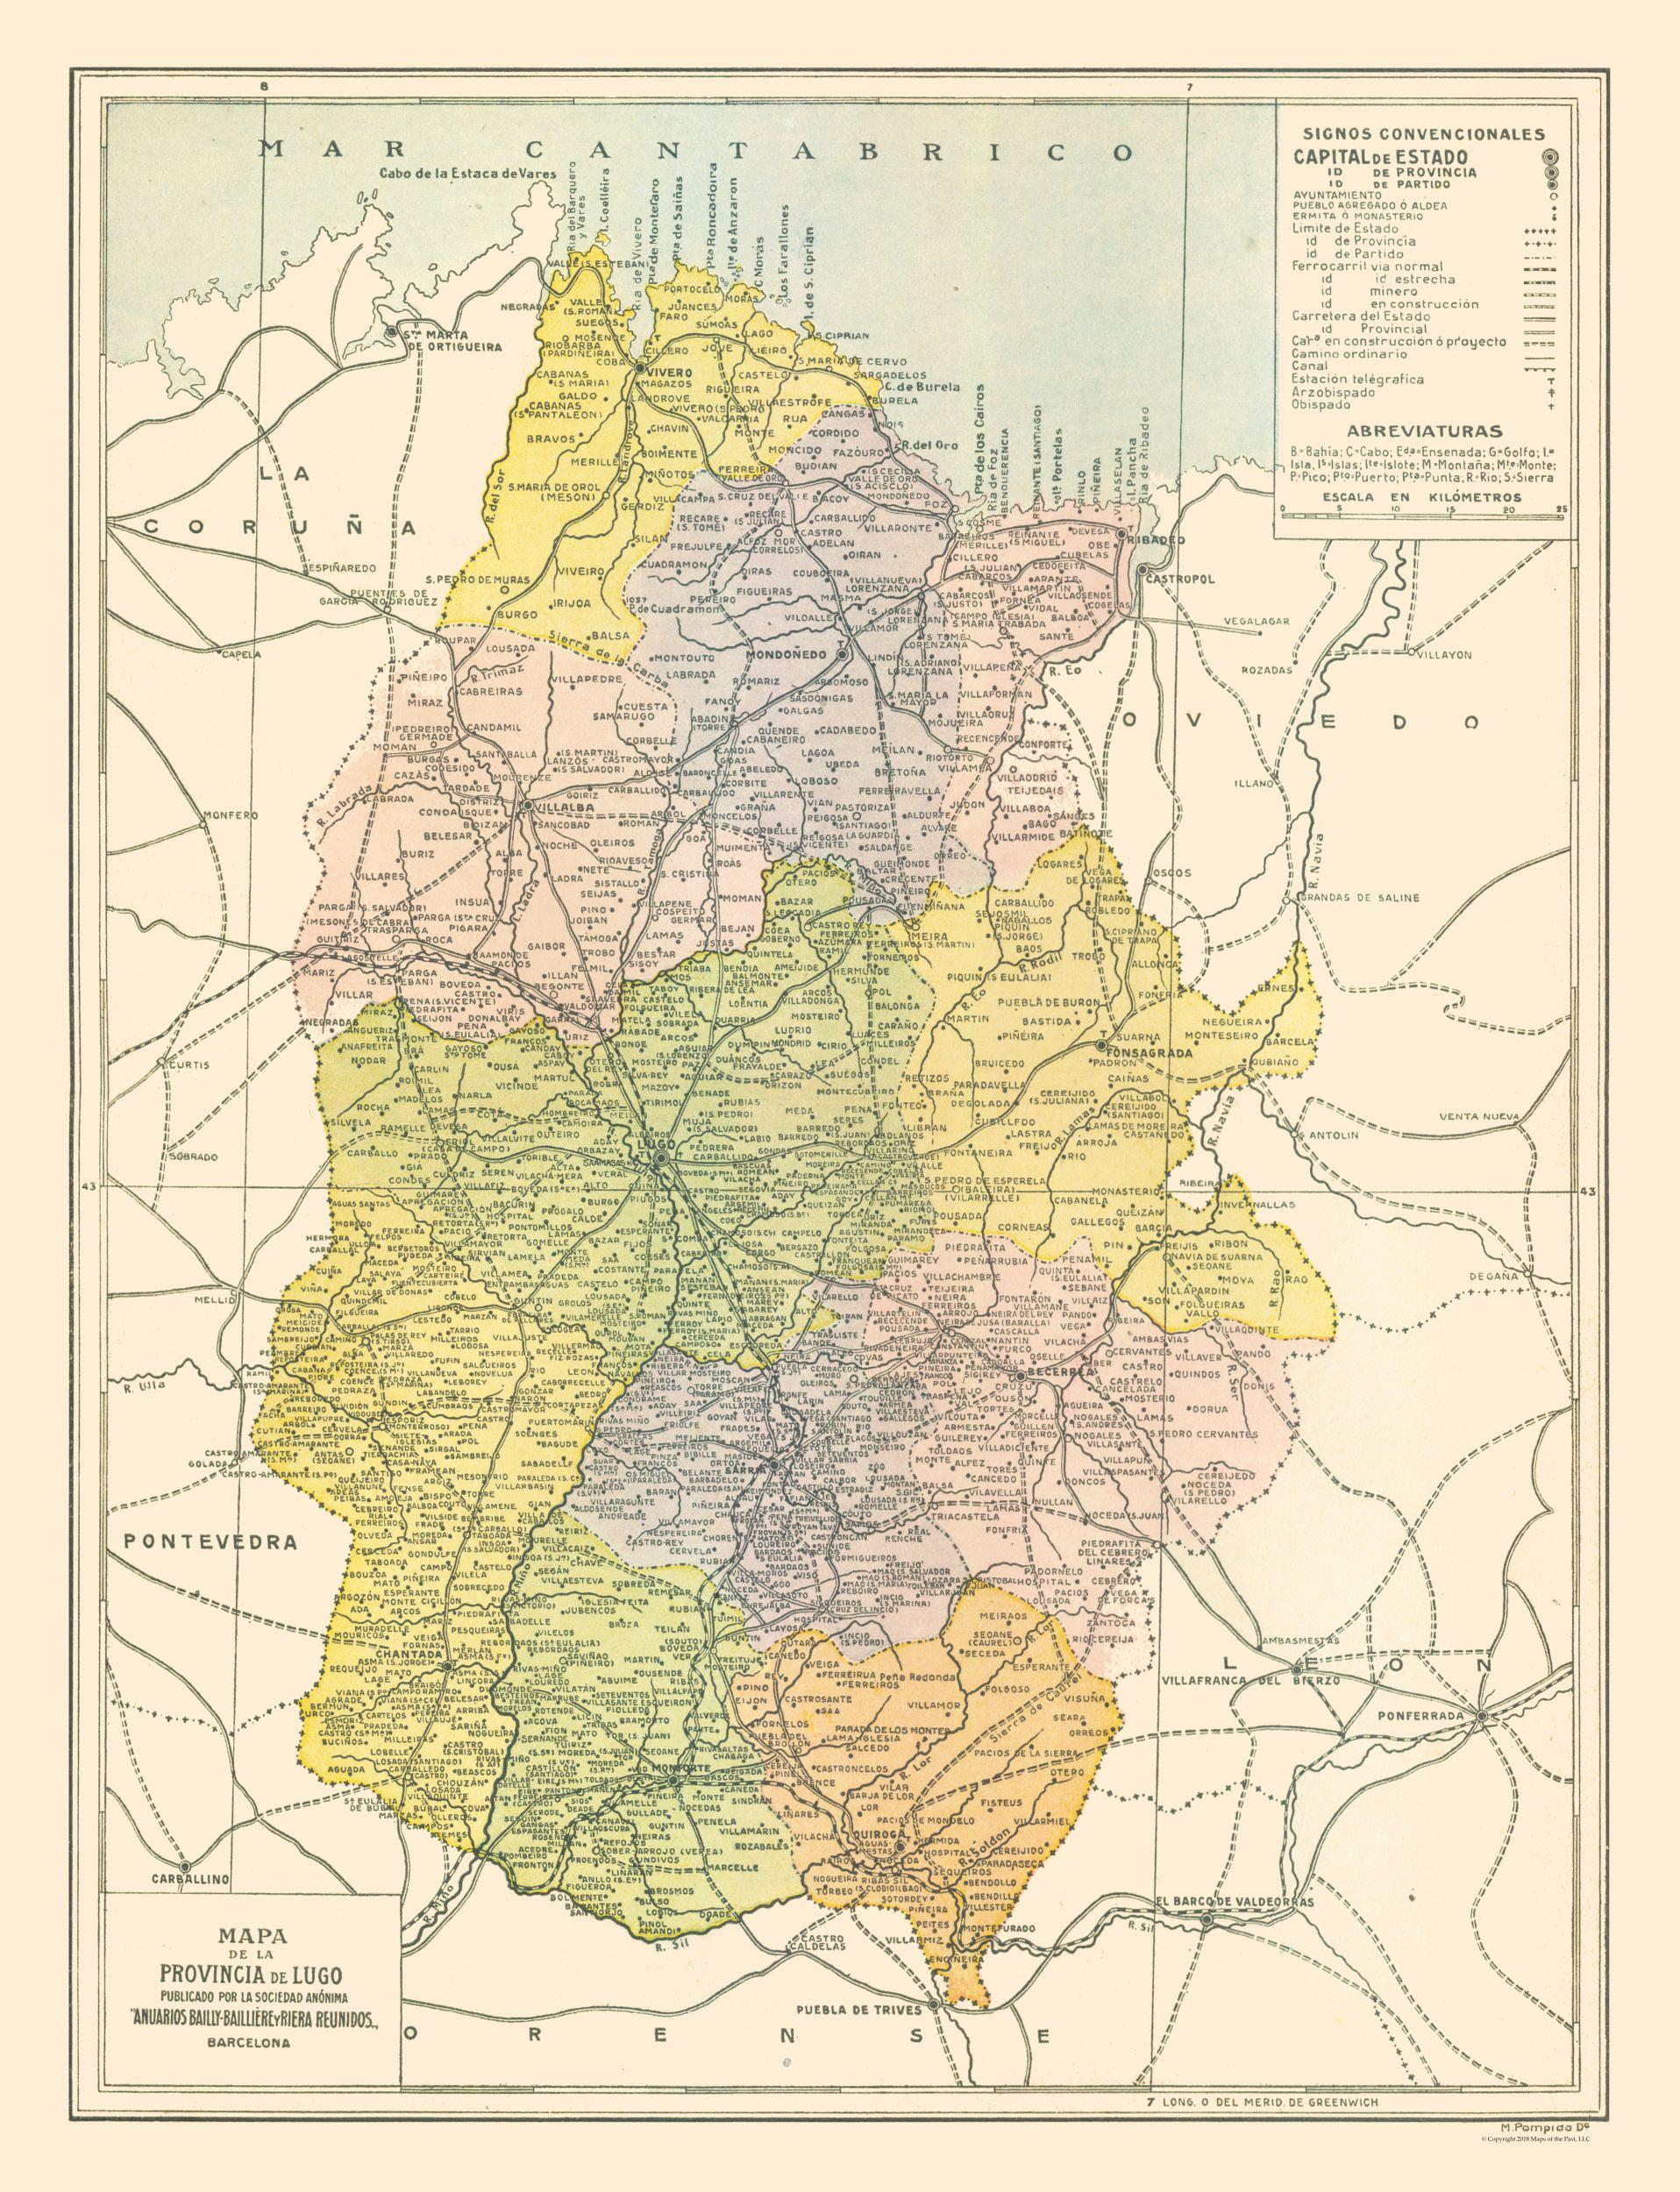 Map Of Spain By Province.International Map Lugo Province Spain Pompido S Atlas 1913 23